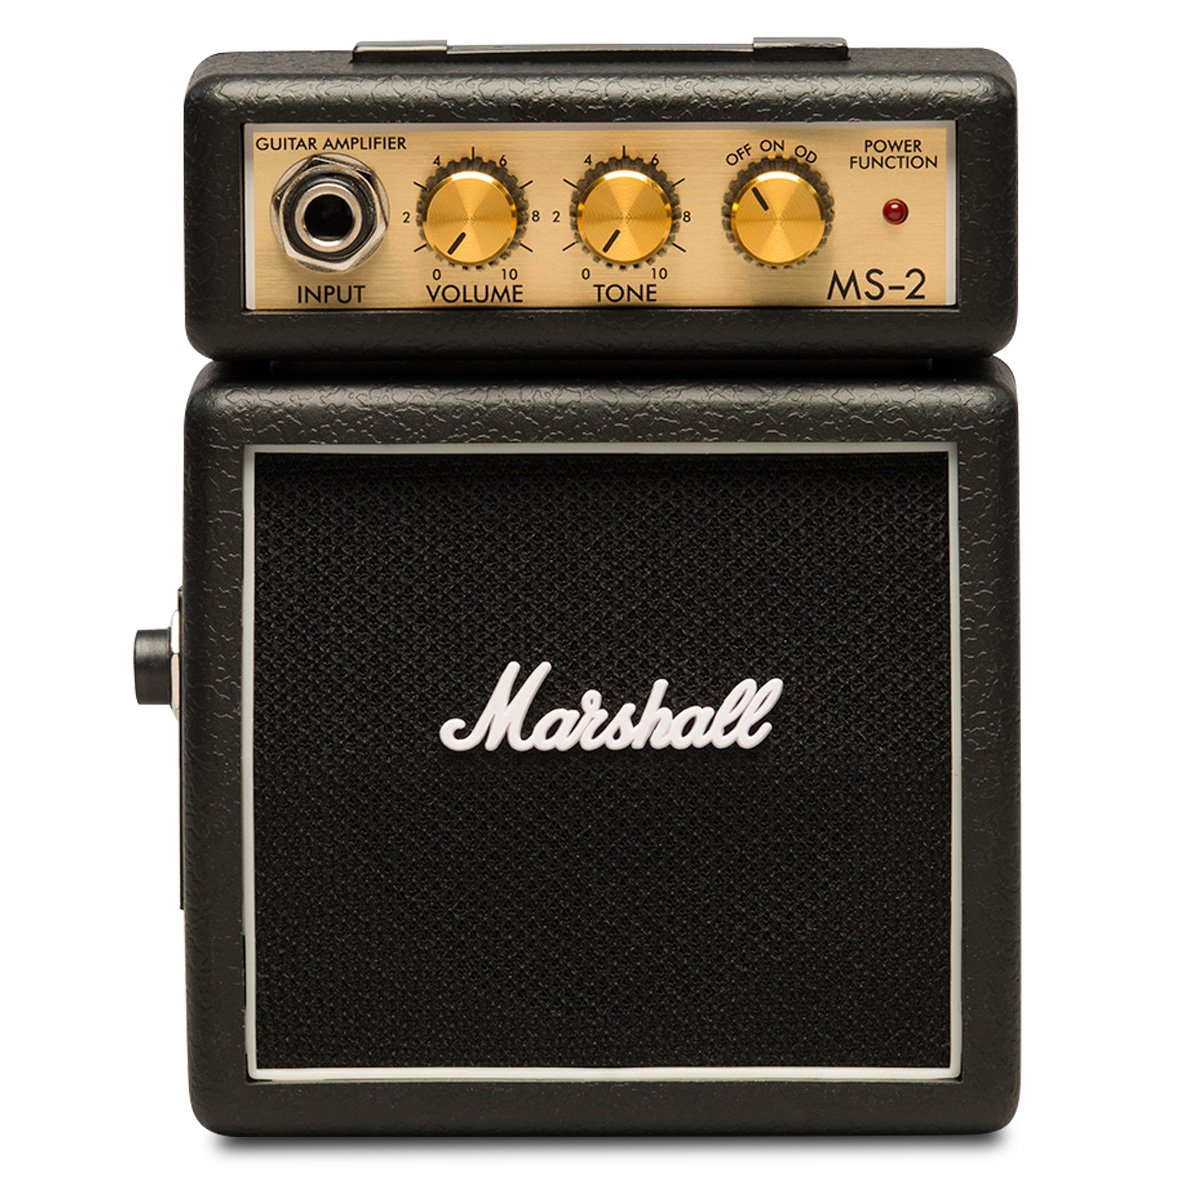 Mini Amplificador para Guitarra Marshall  MS-2